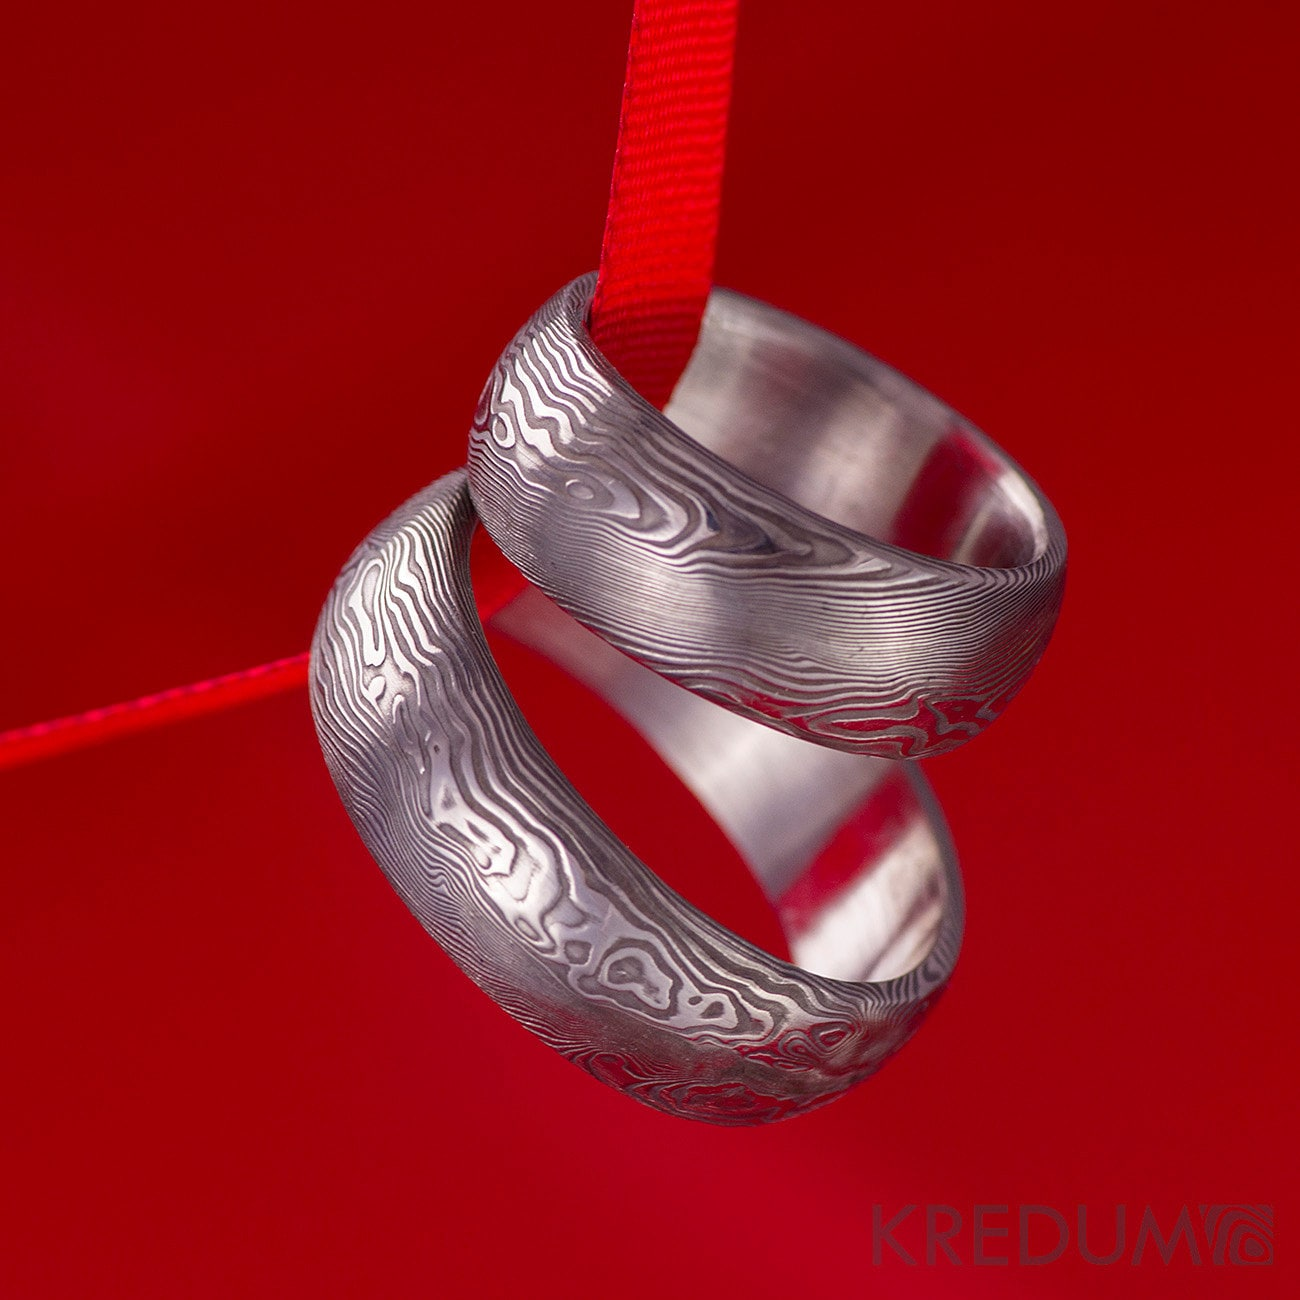 Damascus Steel Ring with Interior Hardwood Sleeve Custom ... |Damascus Steel Rings For Women